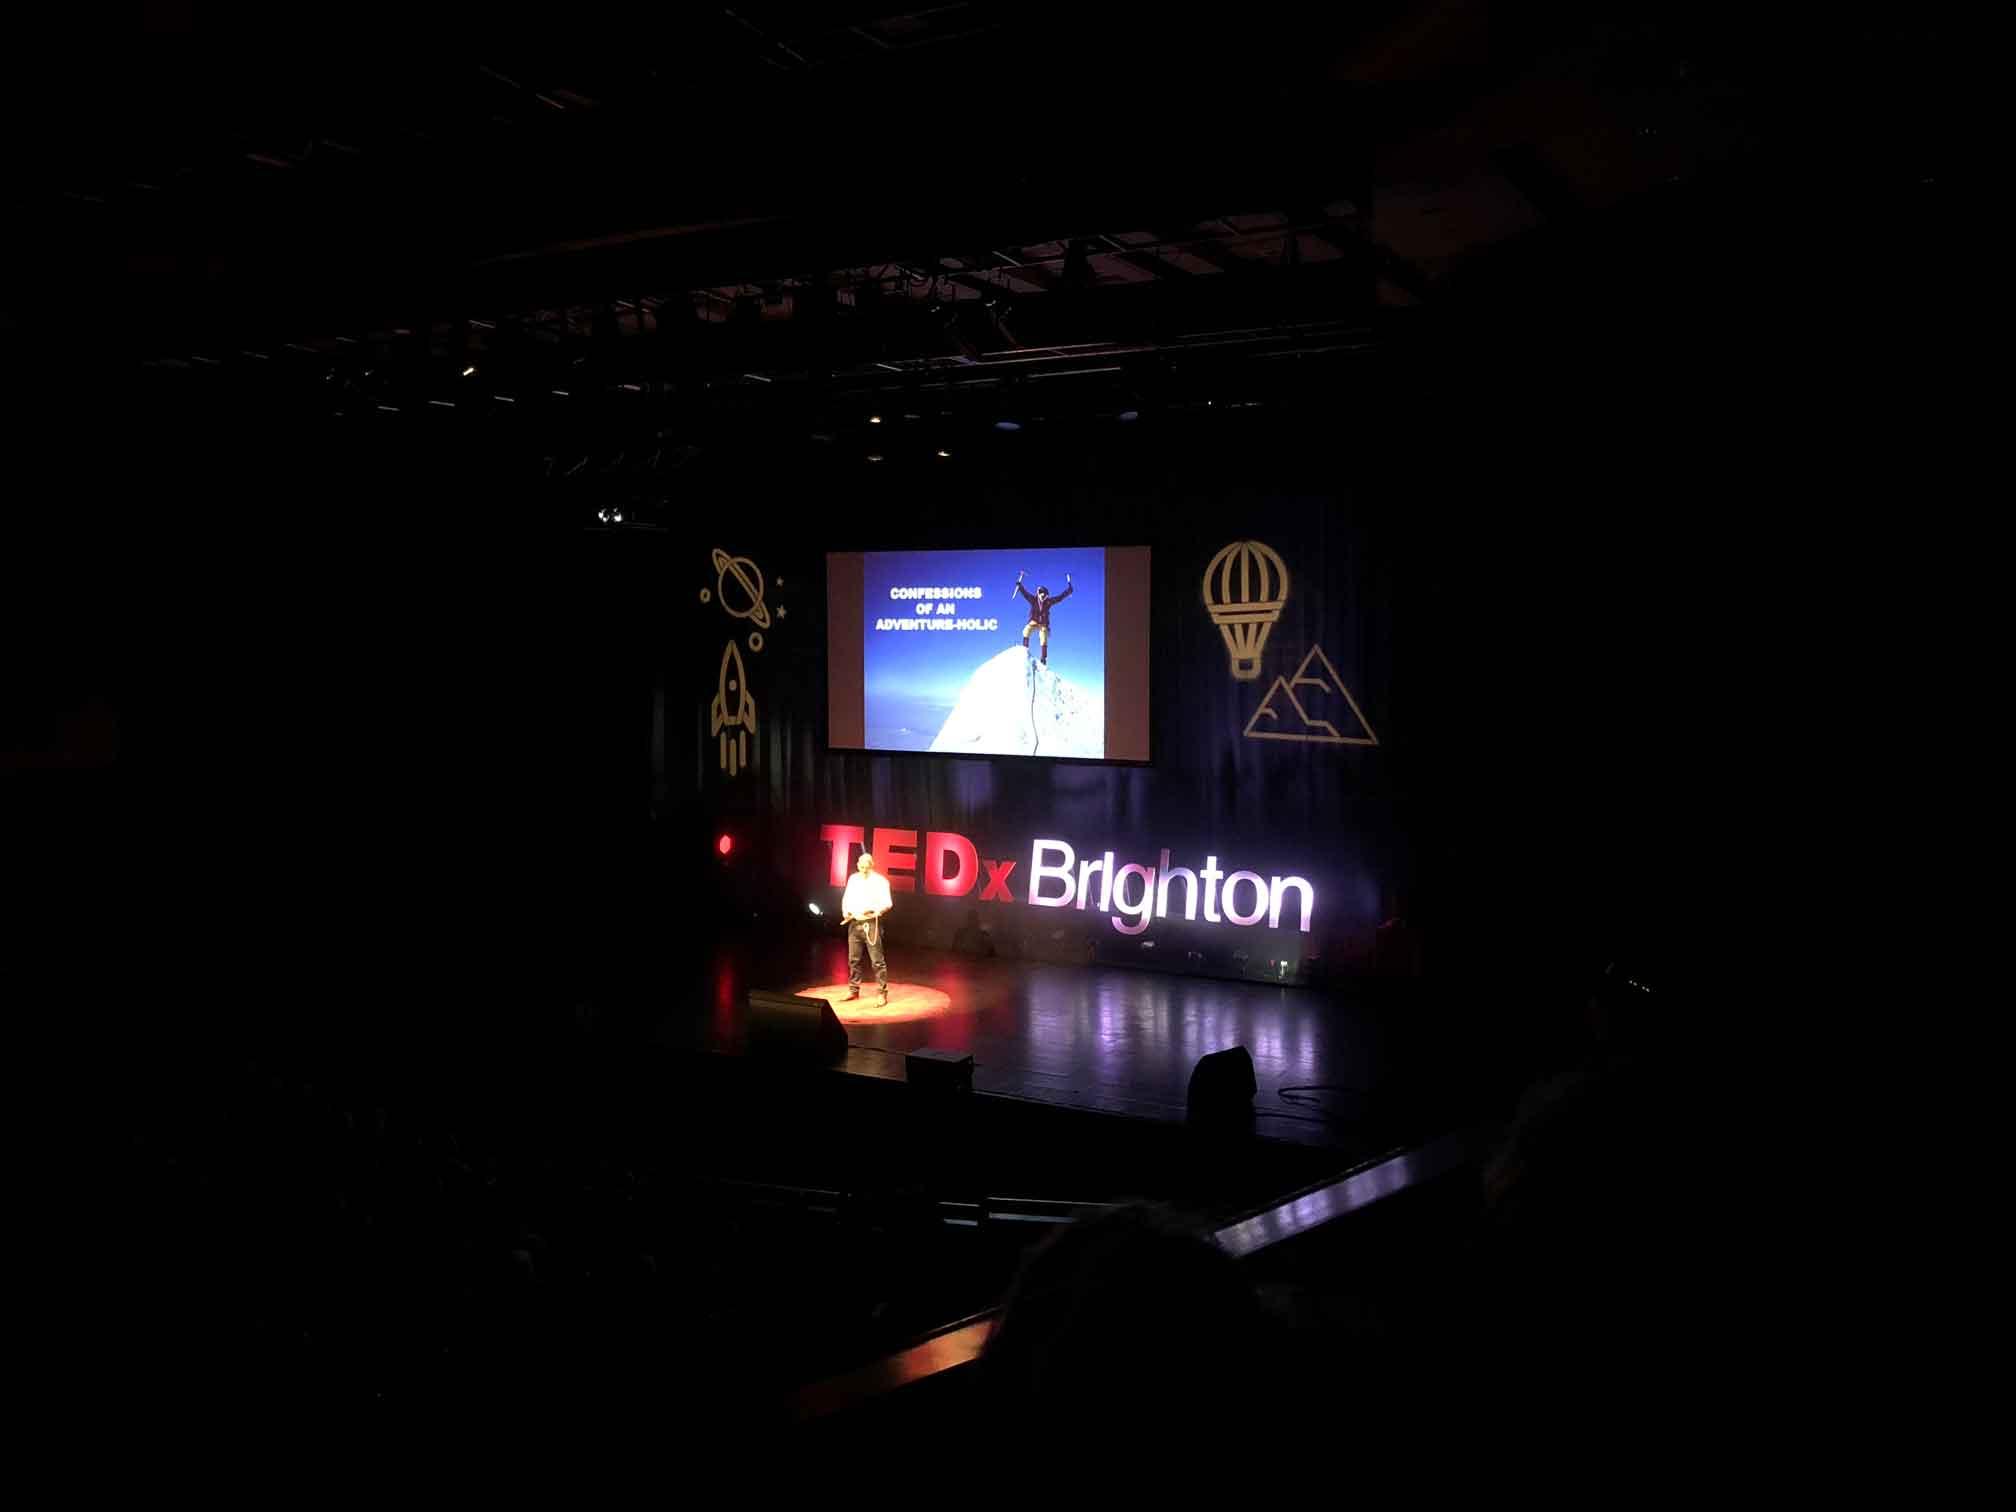 Neil Laughton Speaking at Tedx Brighton